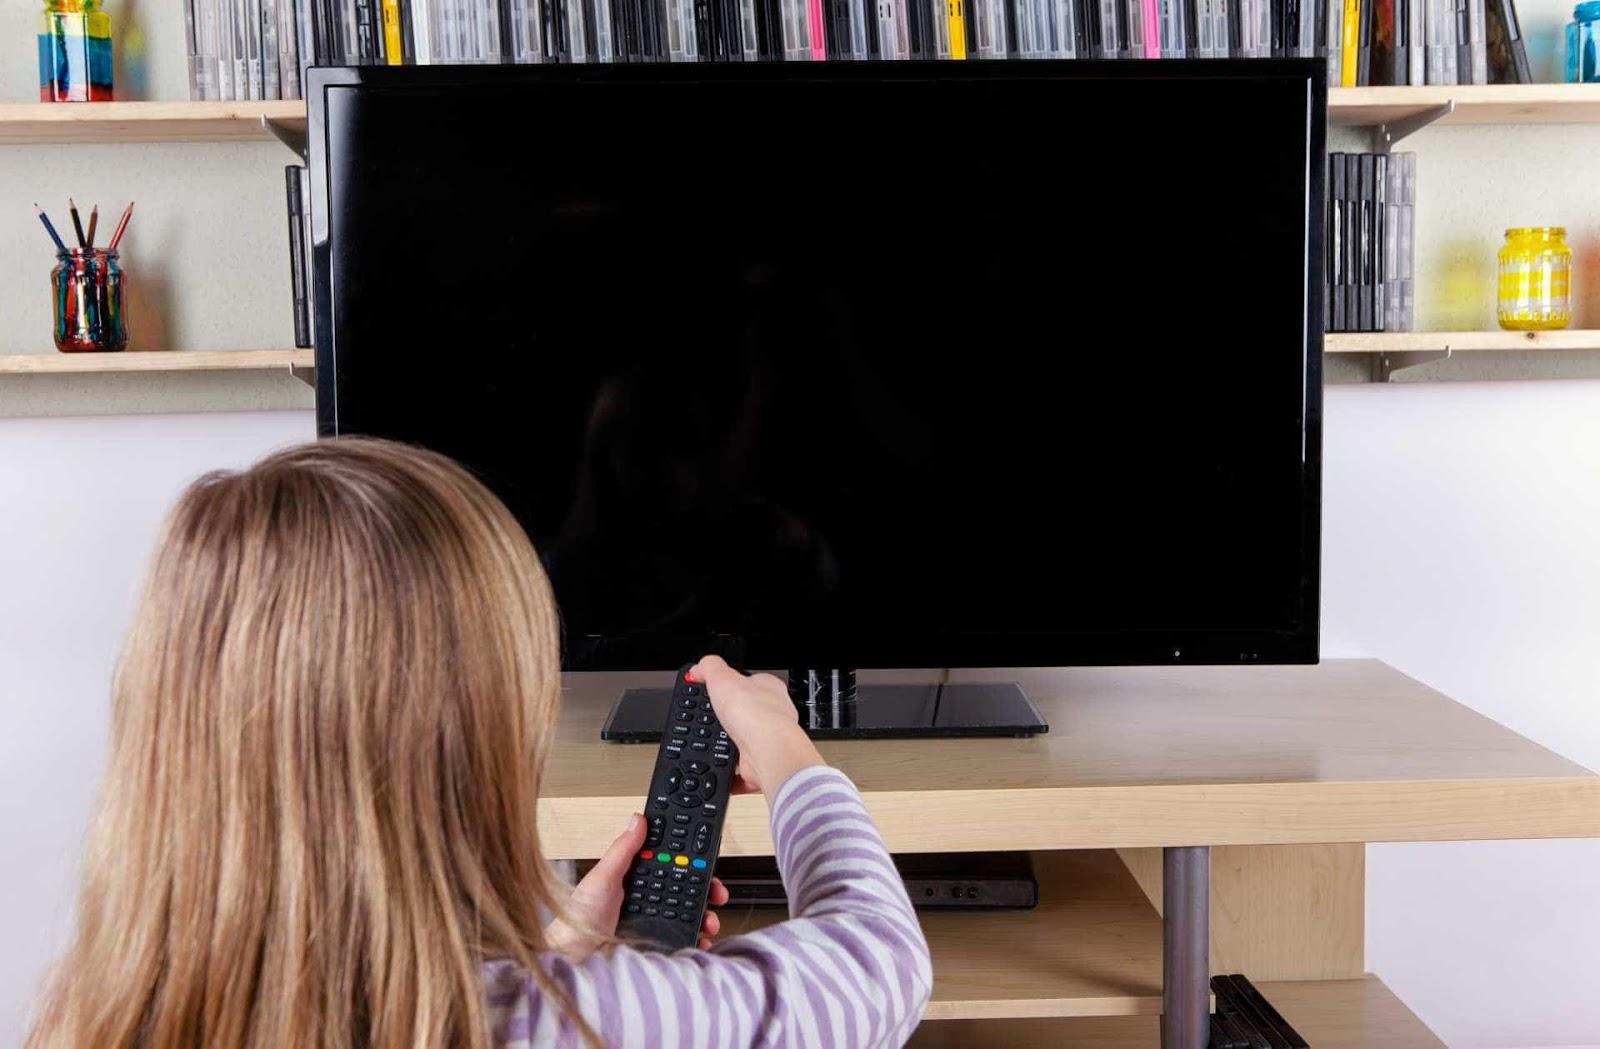 ремонт подсветки телевизора